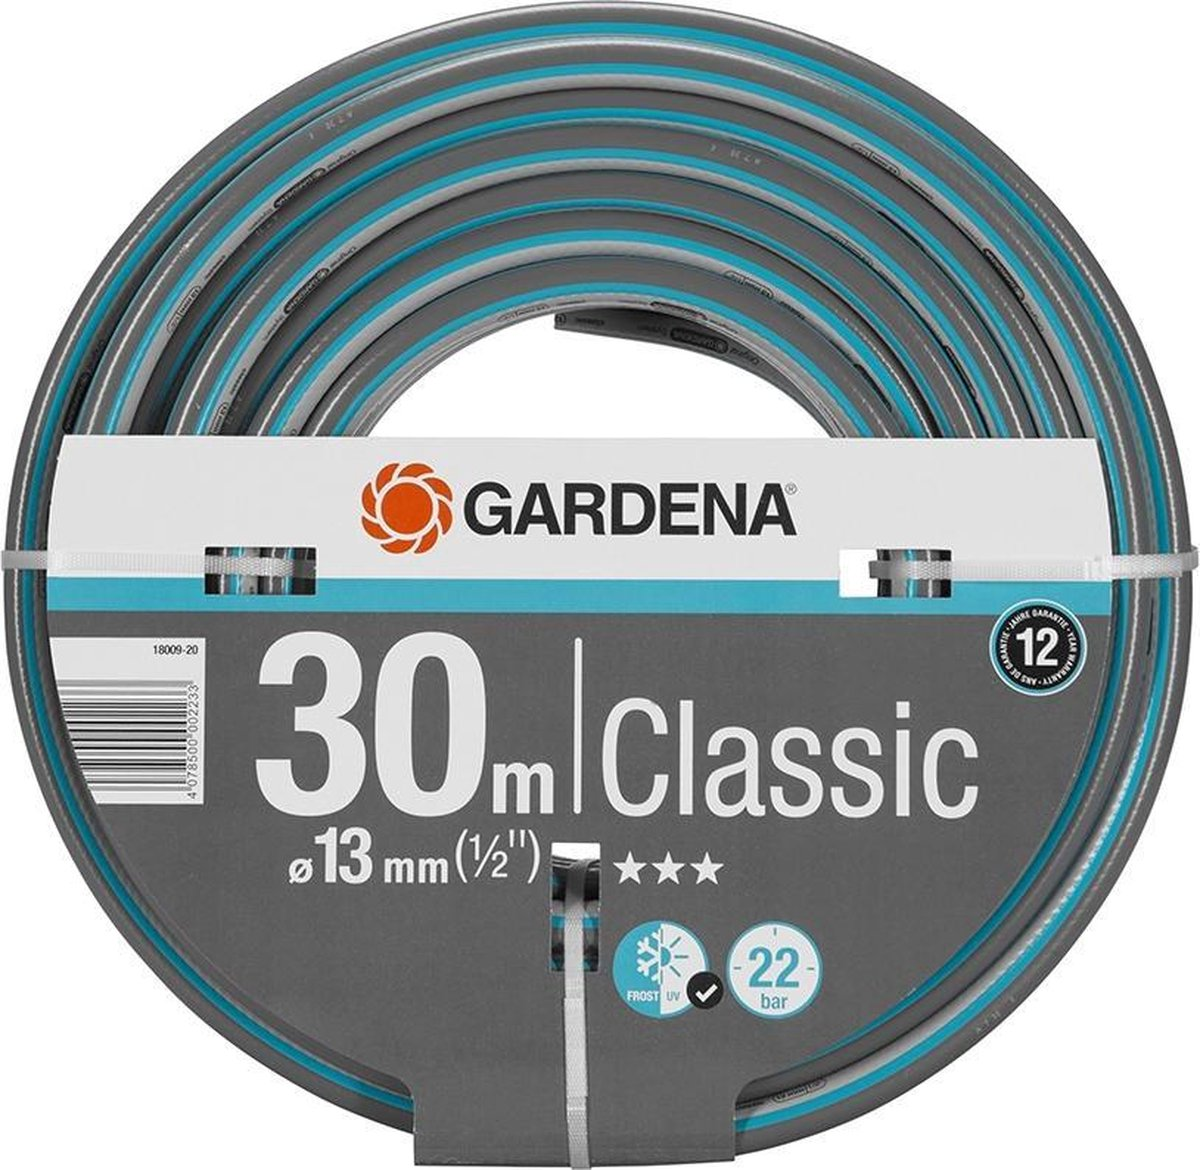 GARDENA Classic Tuinslang  - 30 Meter - 13 mm